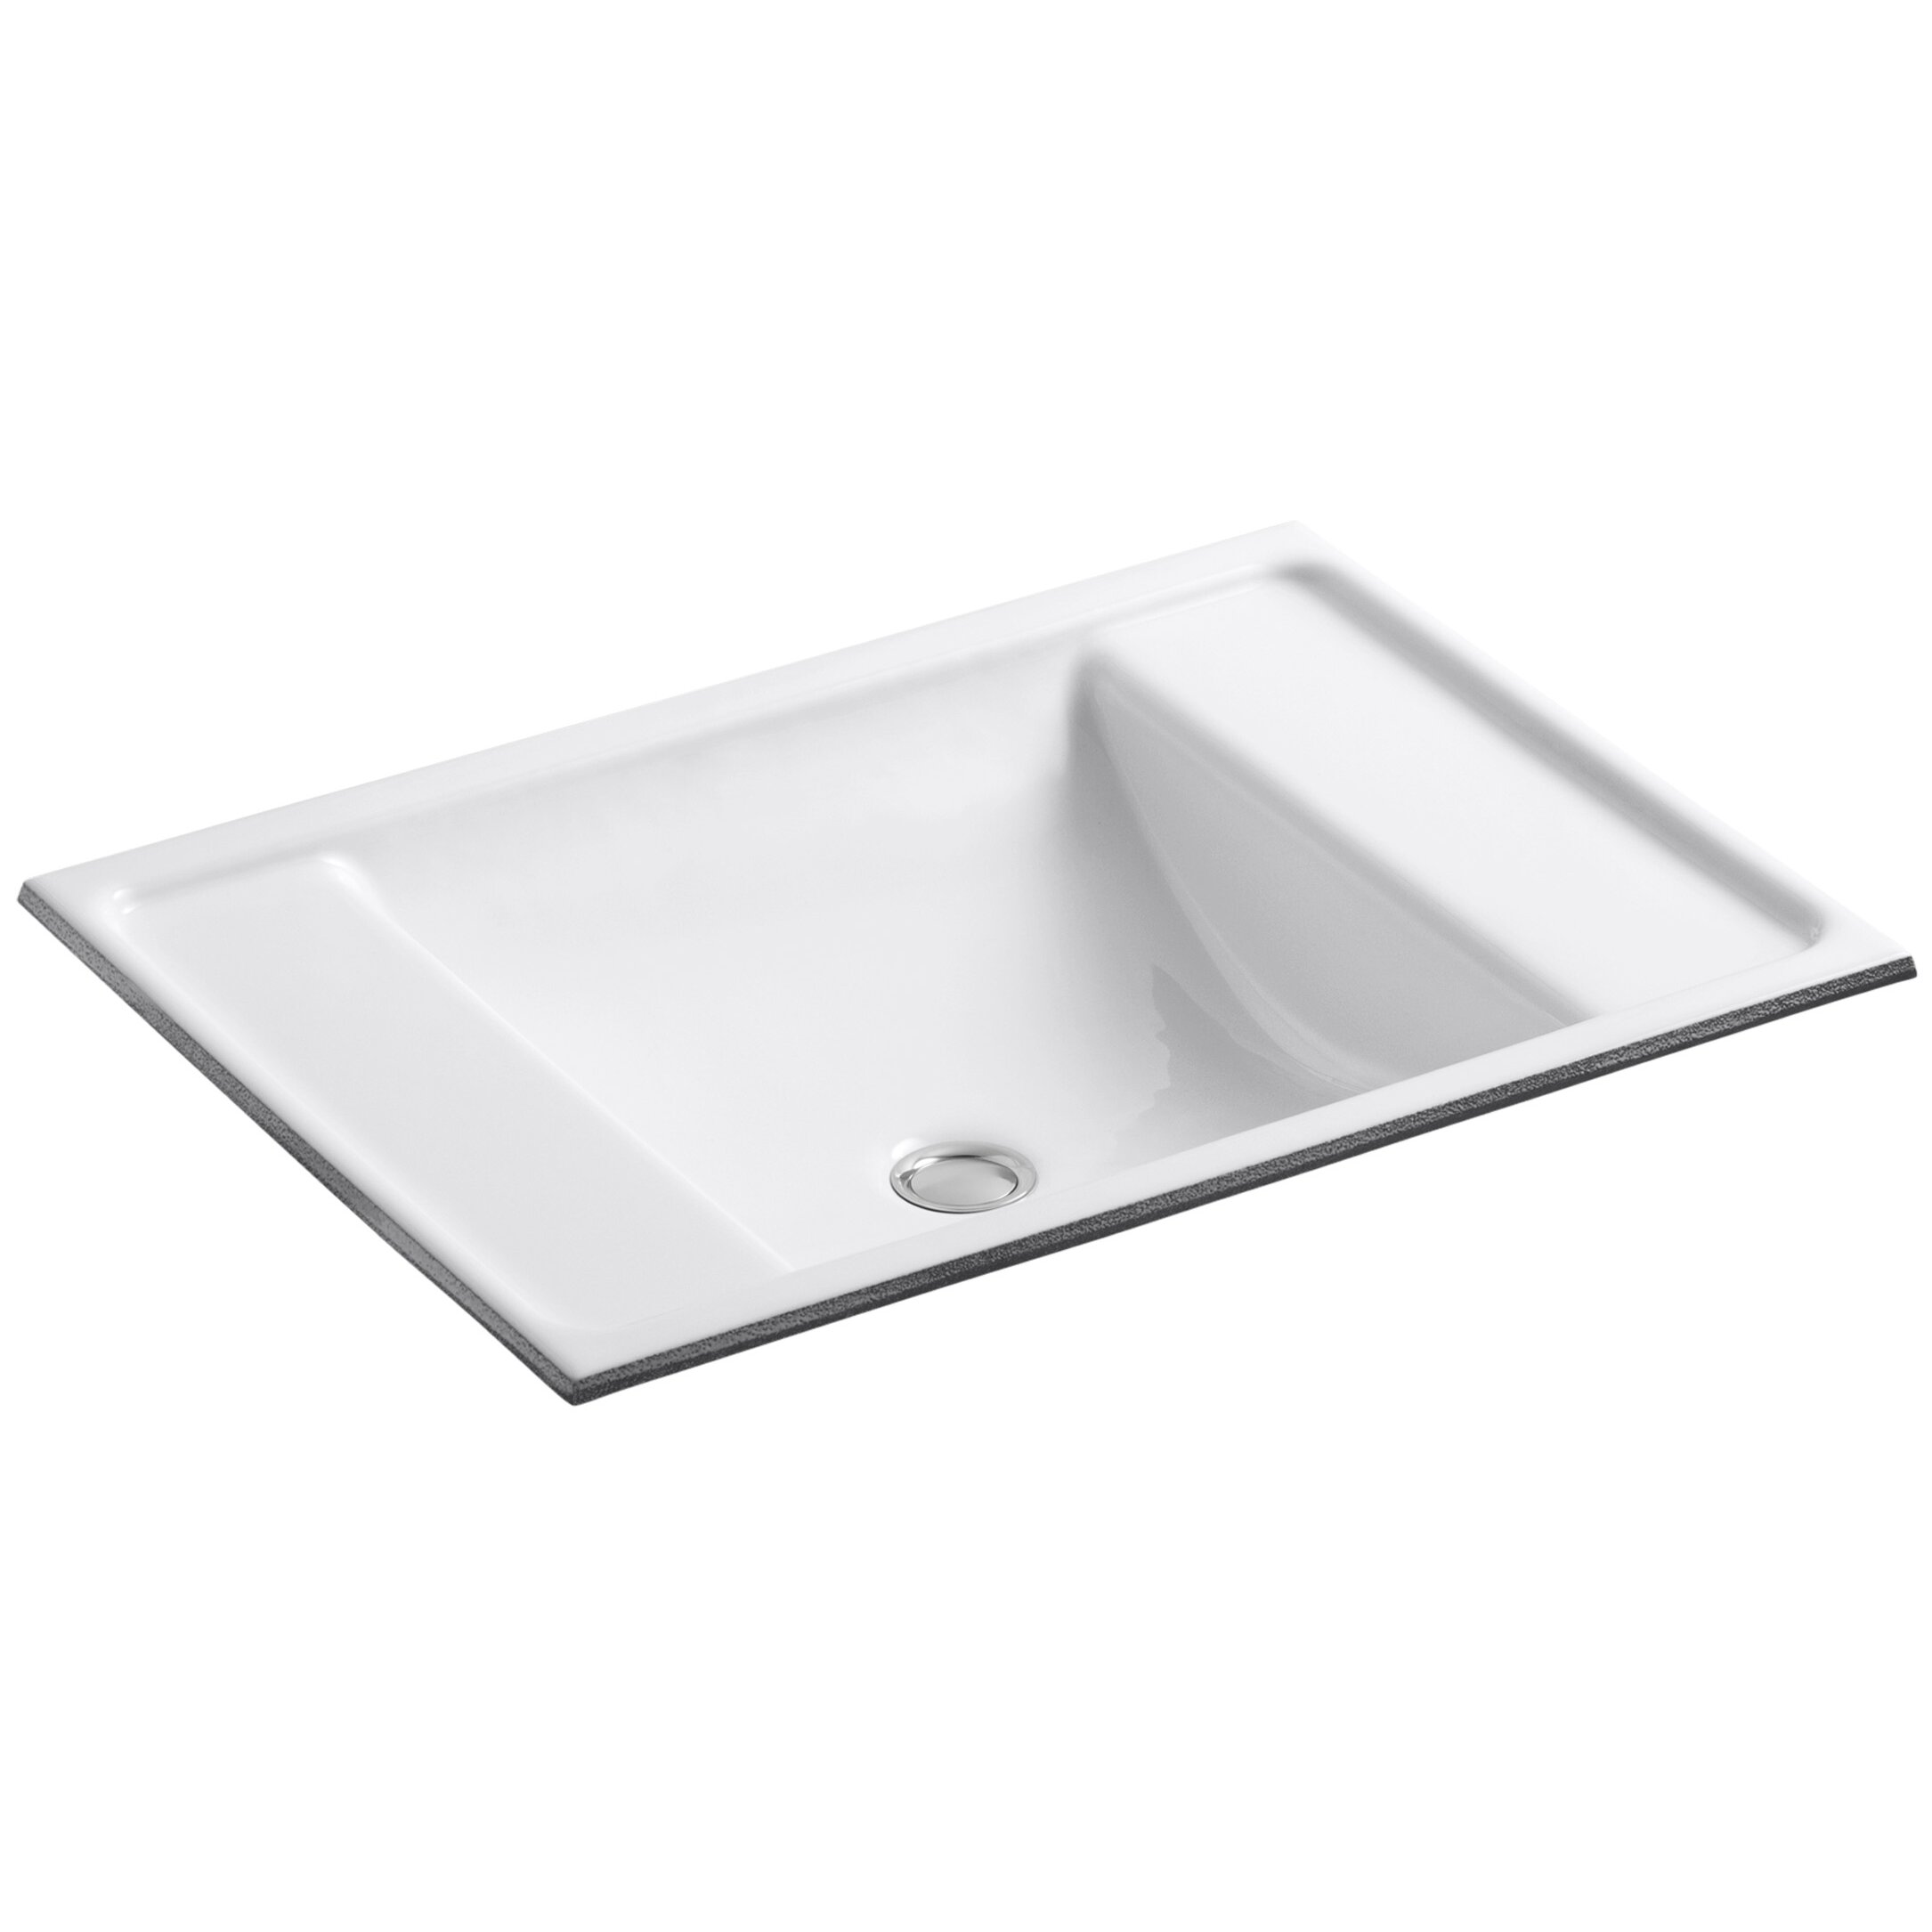 Bathroom Sinks Reviews kohler undermount bathroom sink ~ dact